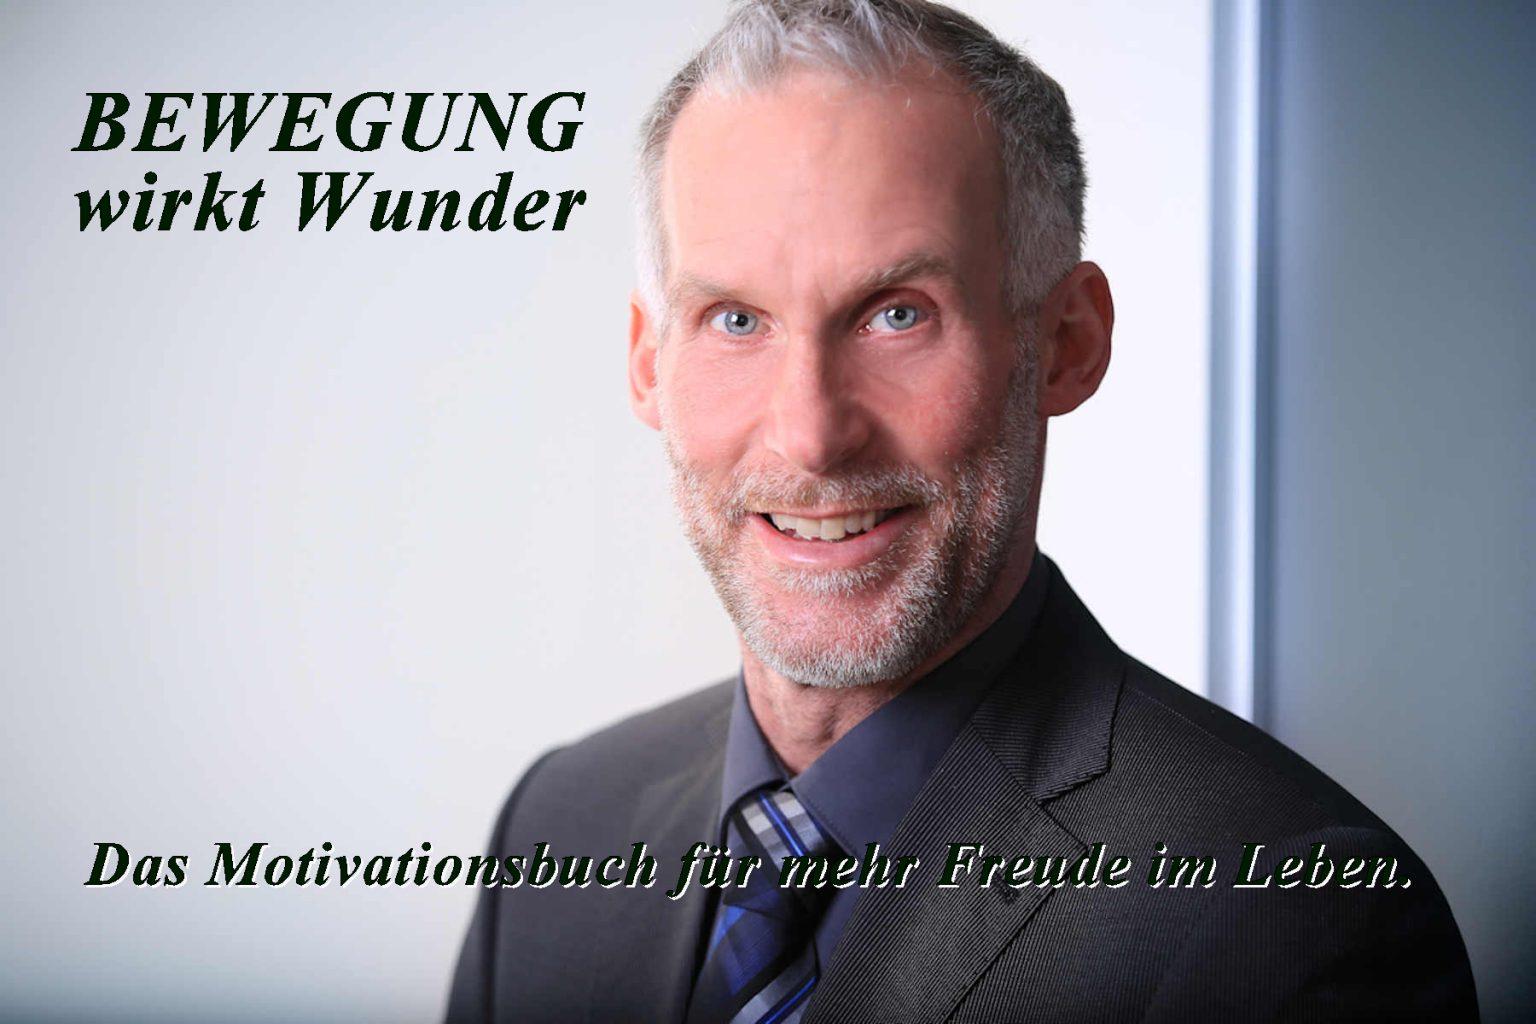 Buch Autor Björn Witt Bewegung wirkt wunder